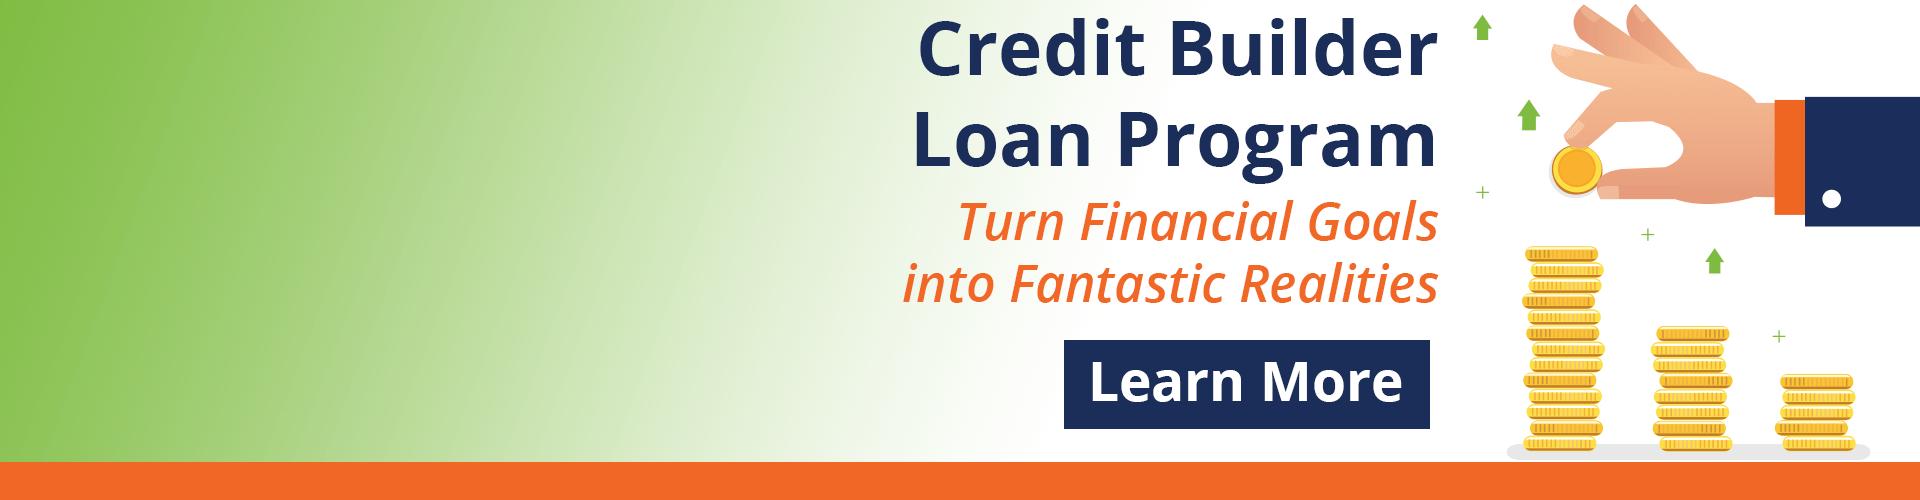 Credit Builder Loan Program